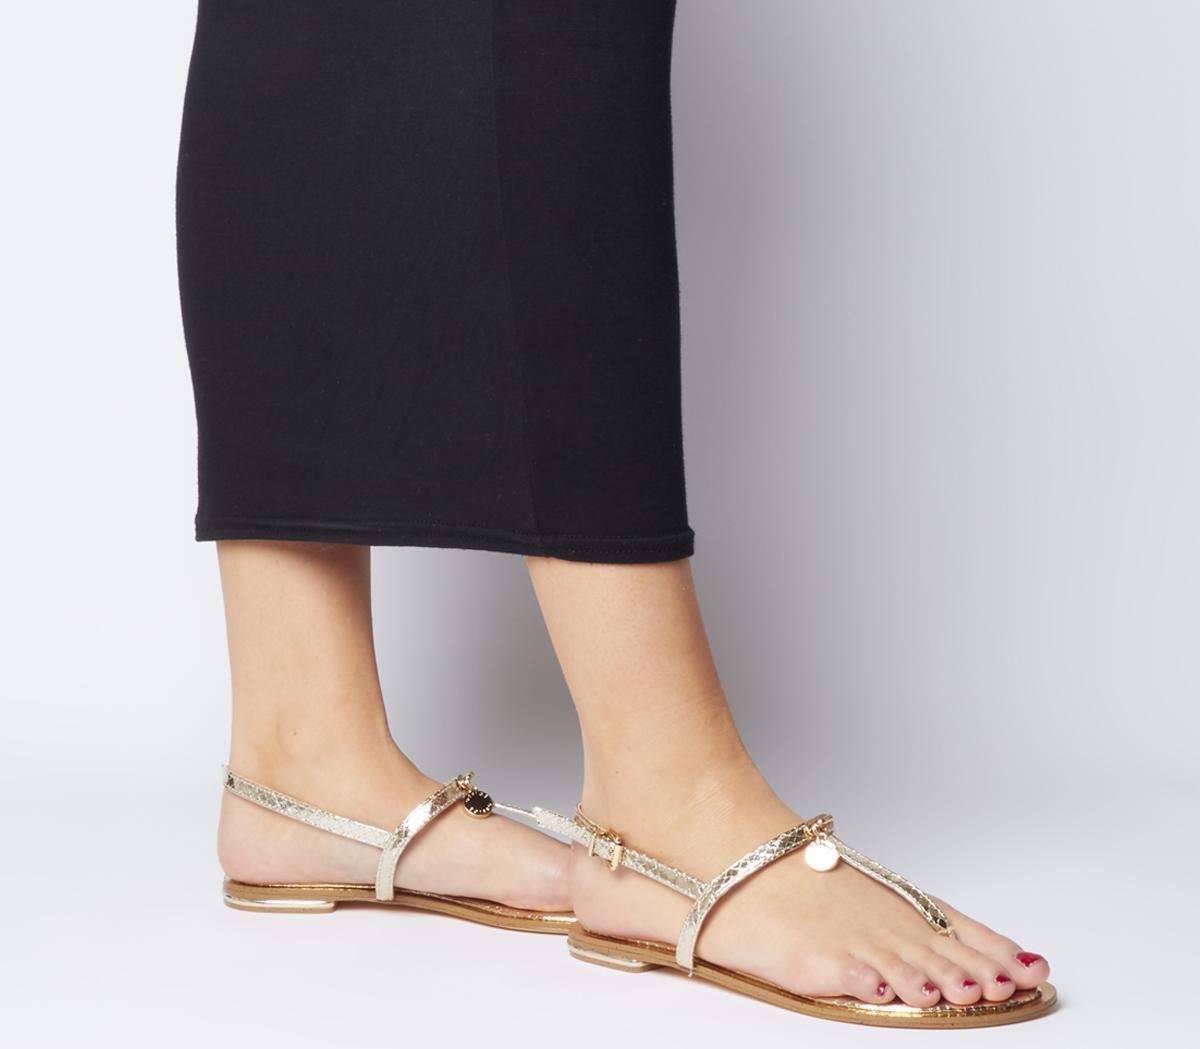 Sunrise Toe Post Sandals